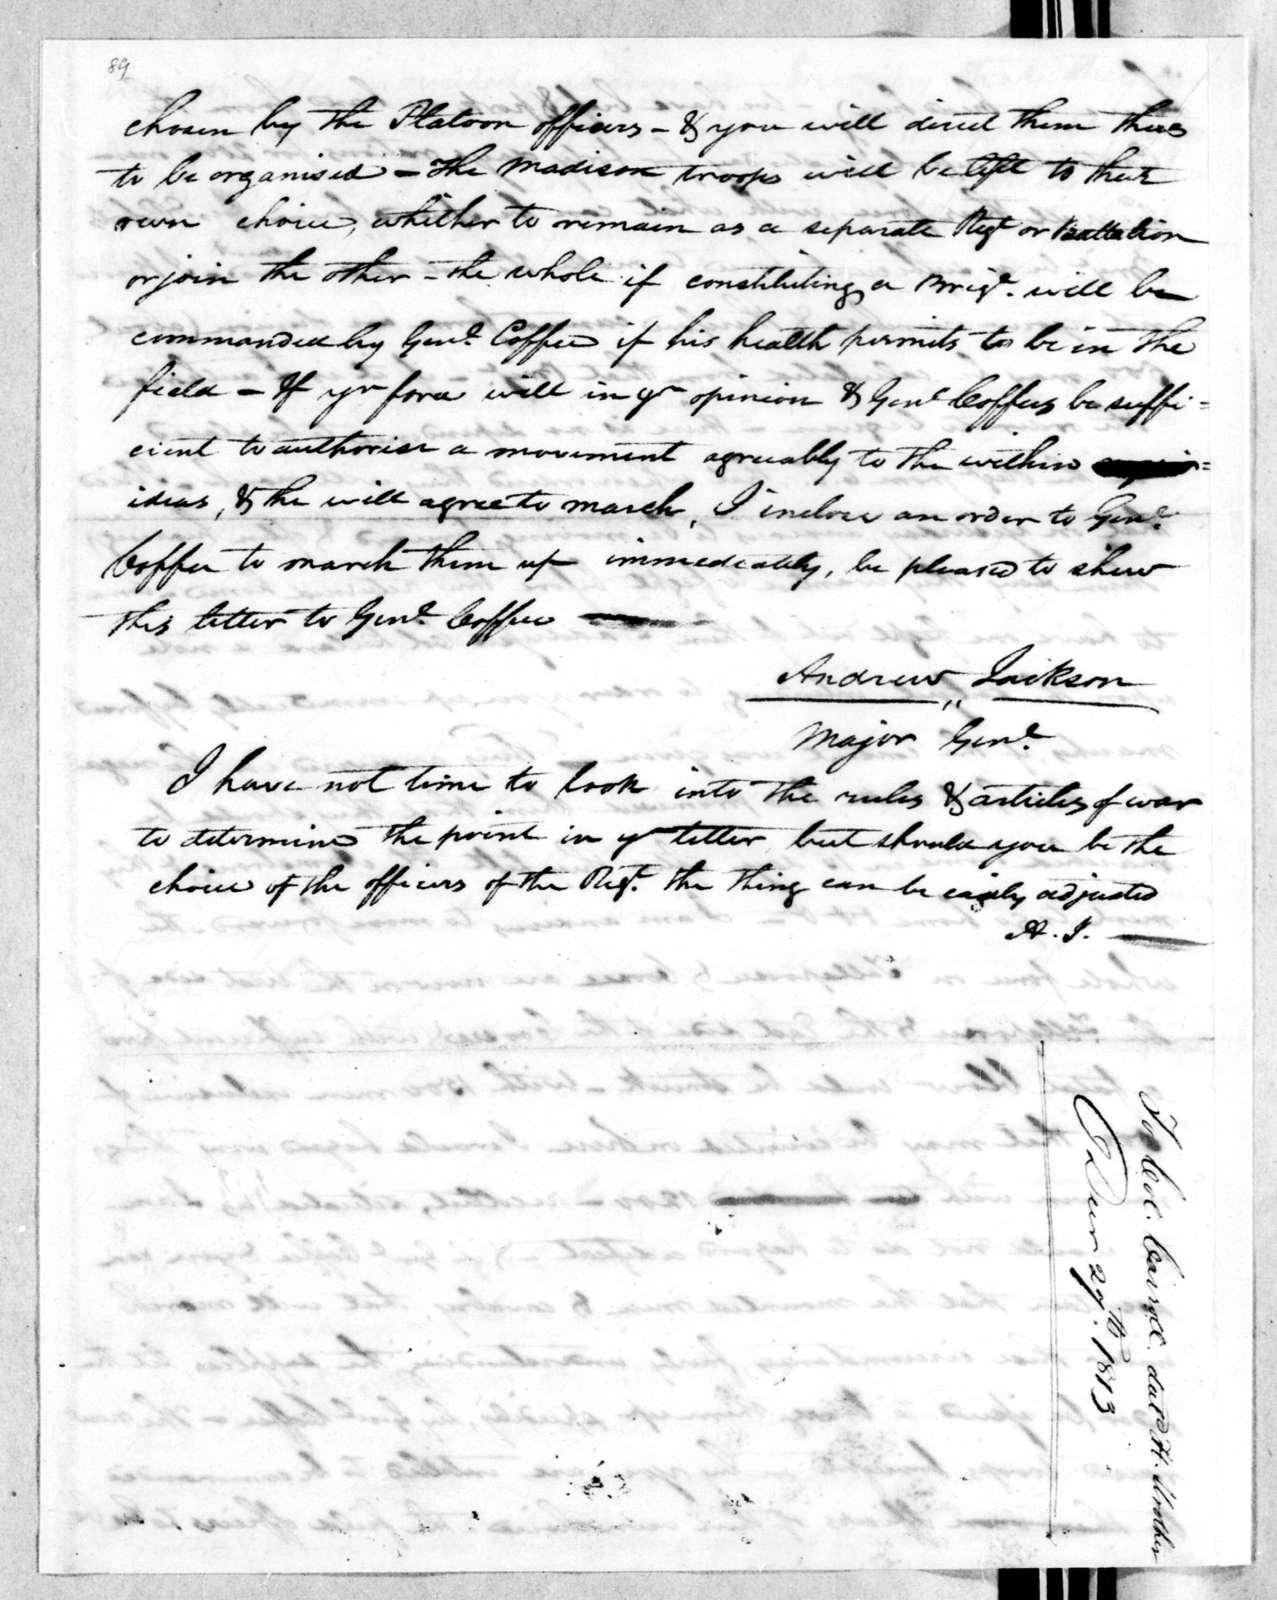 Andrew Jackson to William Carroll, December 27, 1813